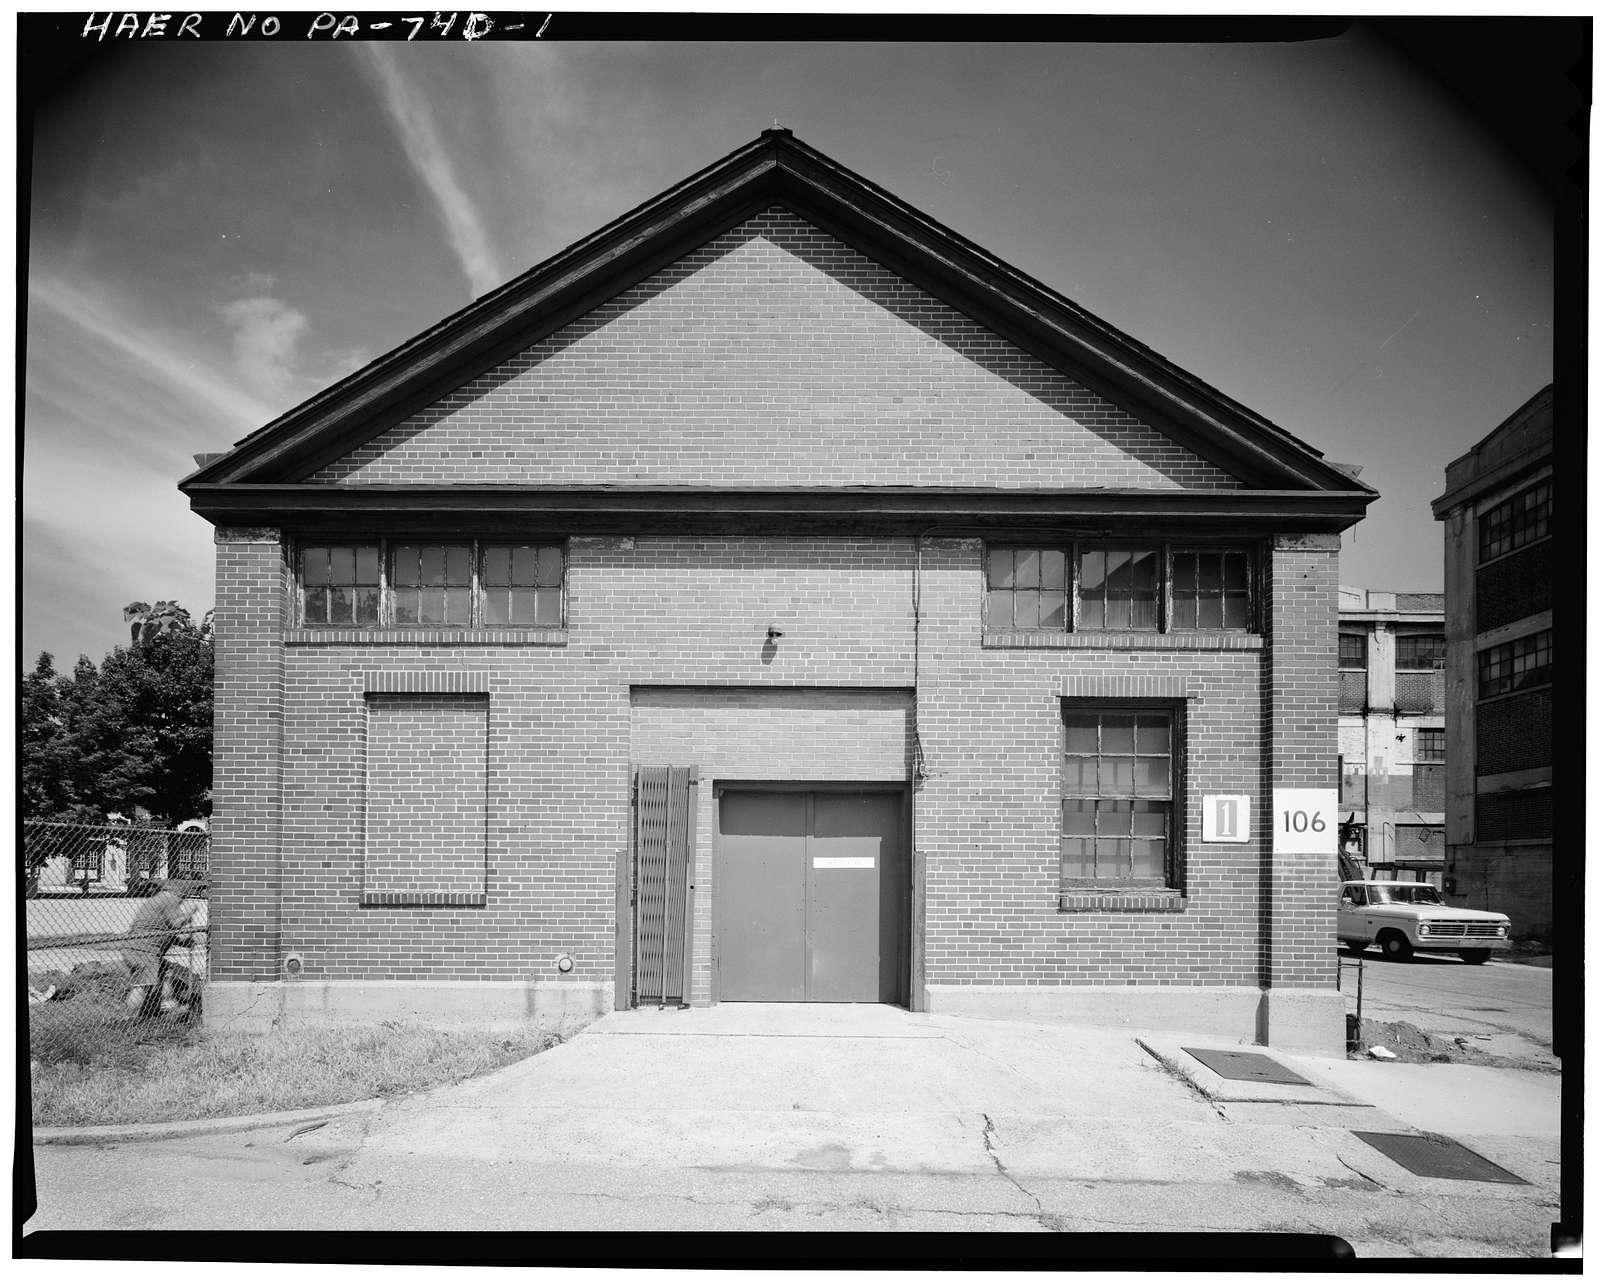 Frankford Arsenal, Building No. 106, South of Tacony Street between Bridge Street & tracks of former Pennsylvania Railroad, Philadelphia, Philadelphia County, PA